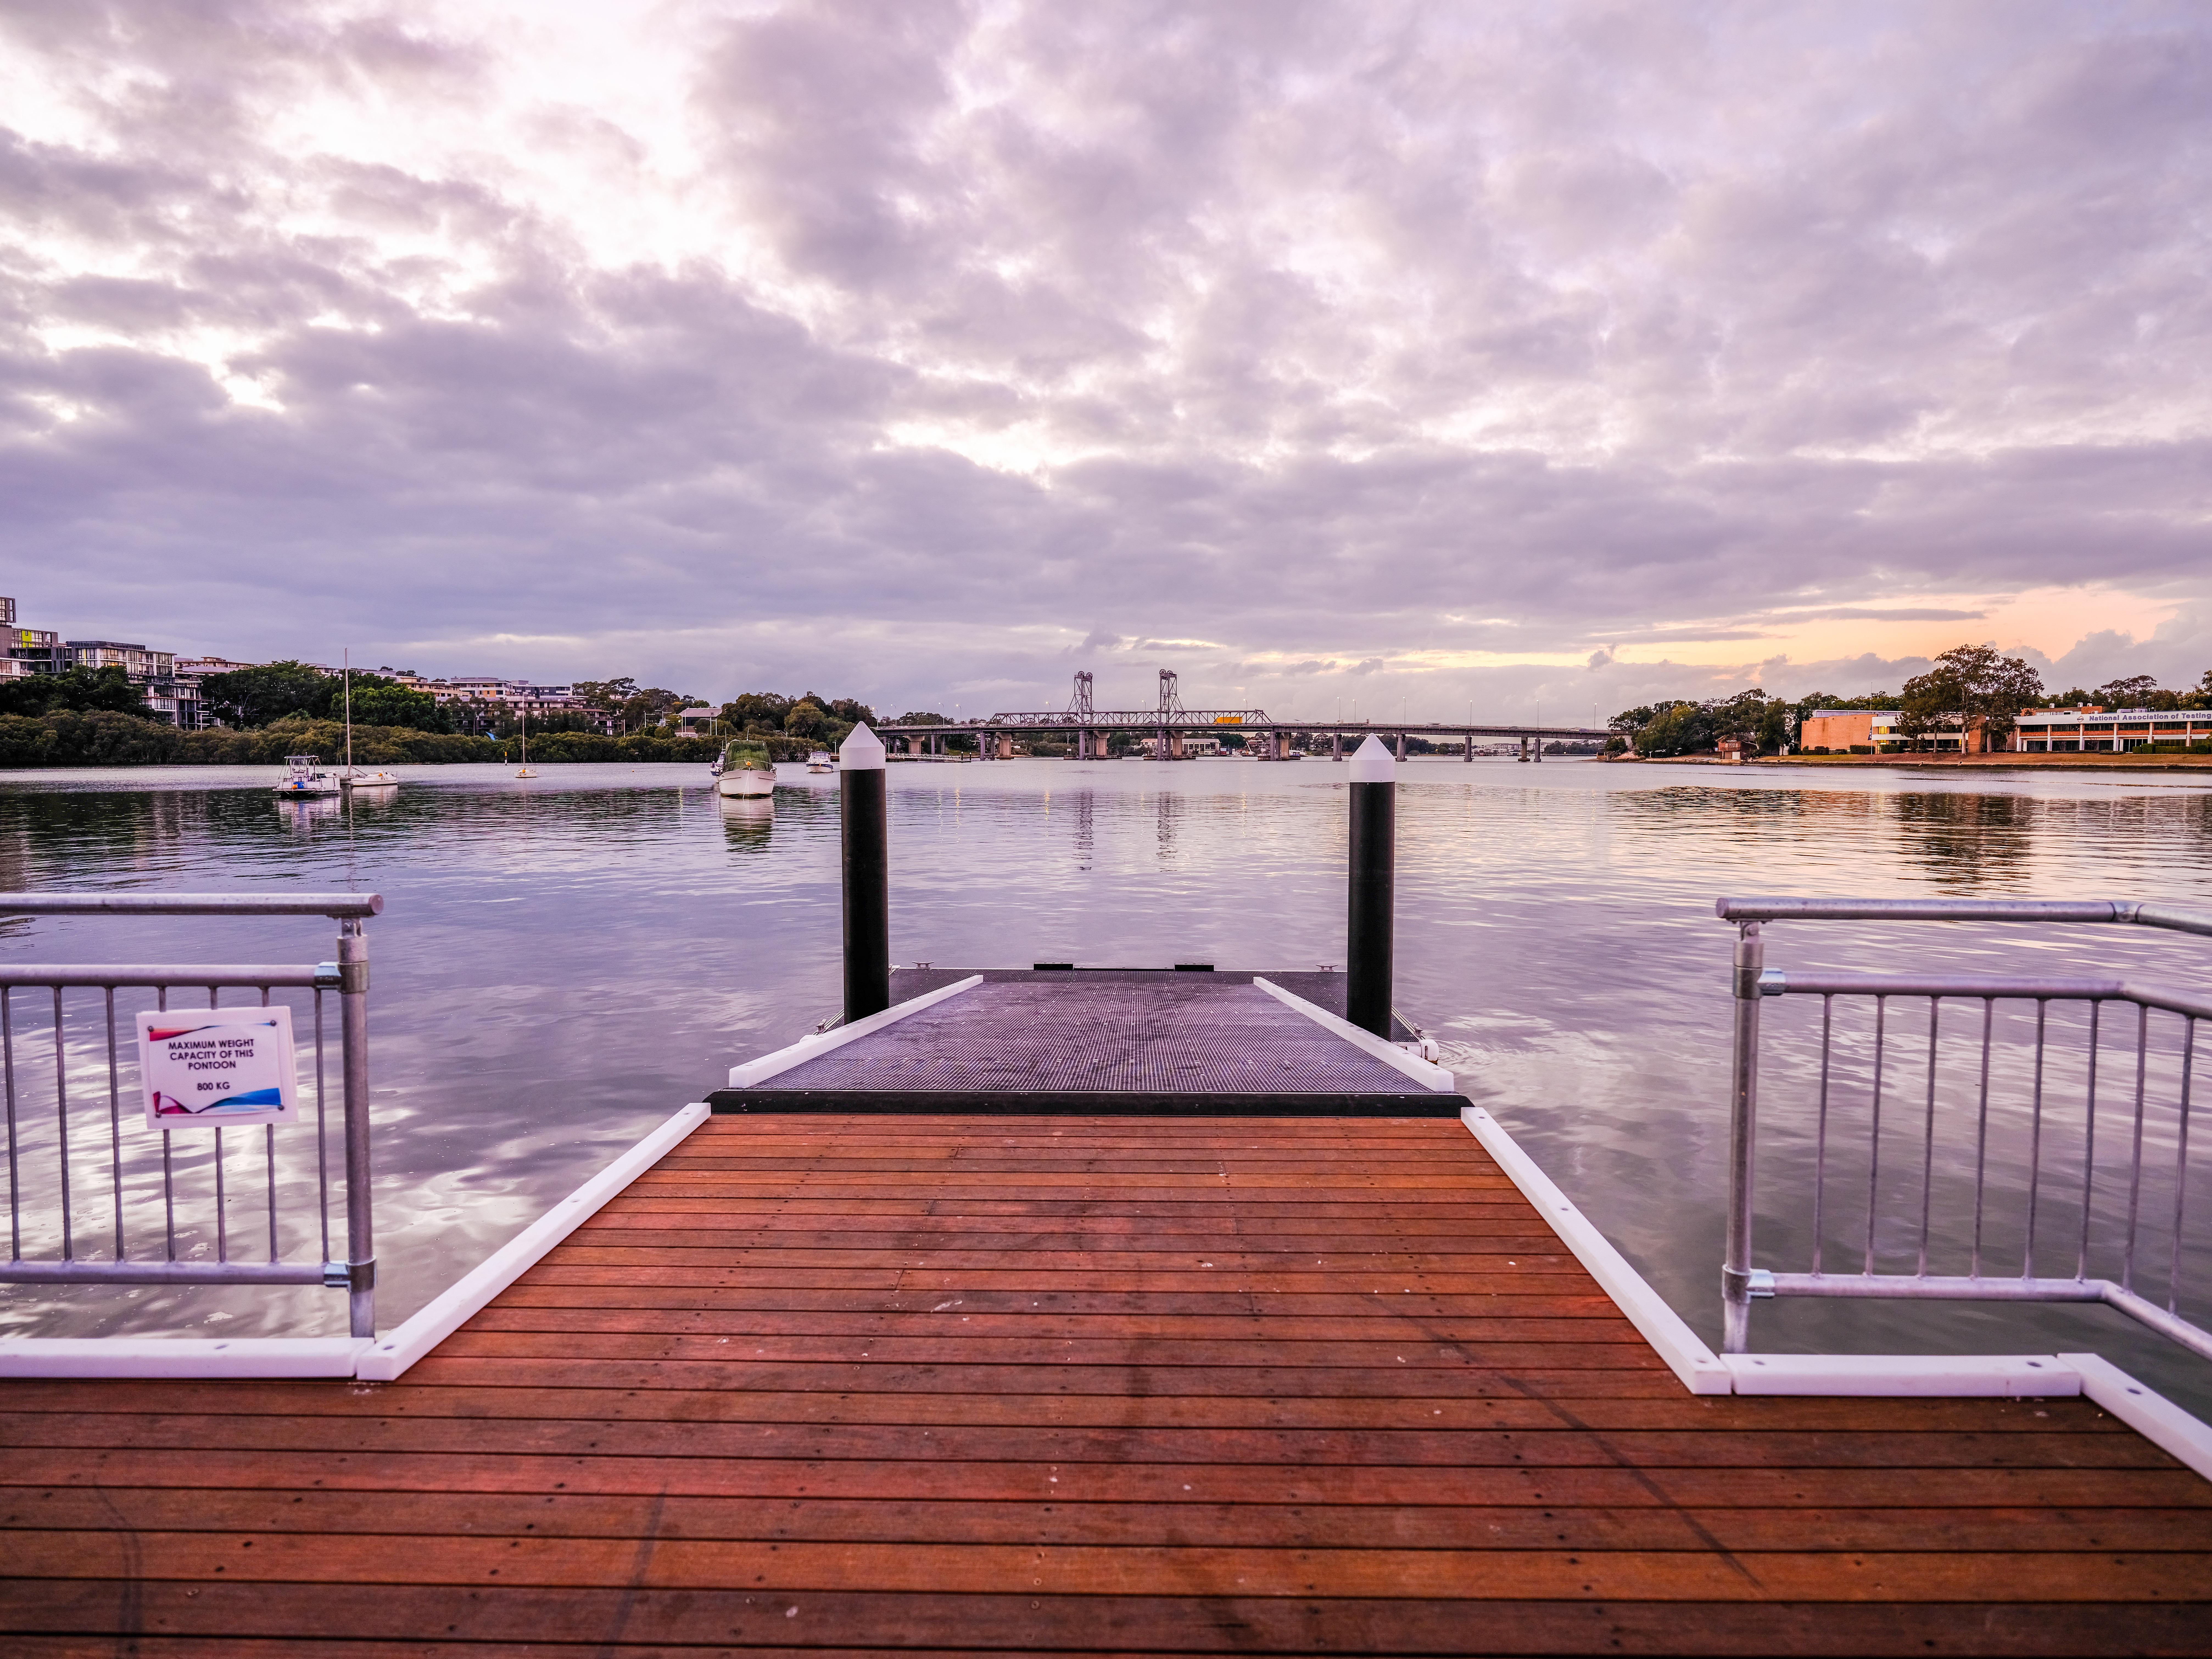 Fujifilm GFX50S II sample shot – a wooden jetty on a river